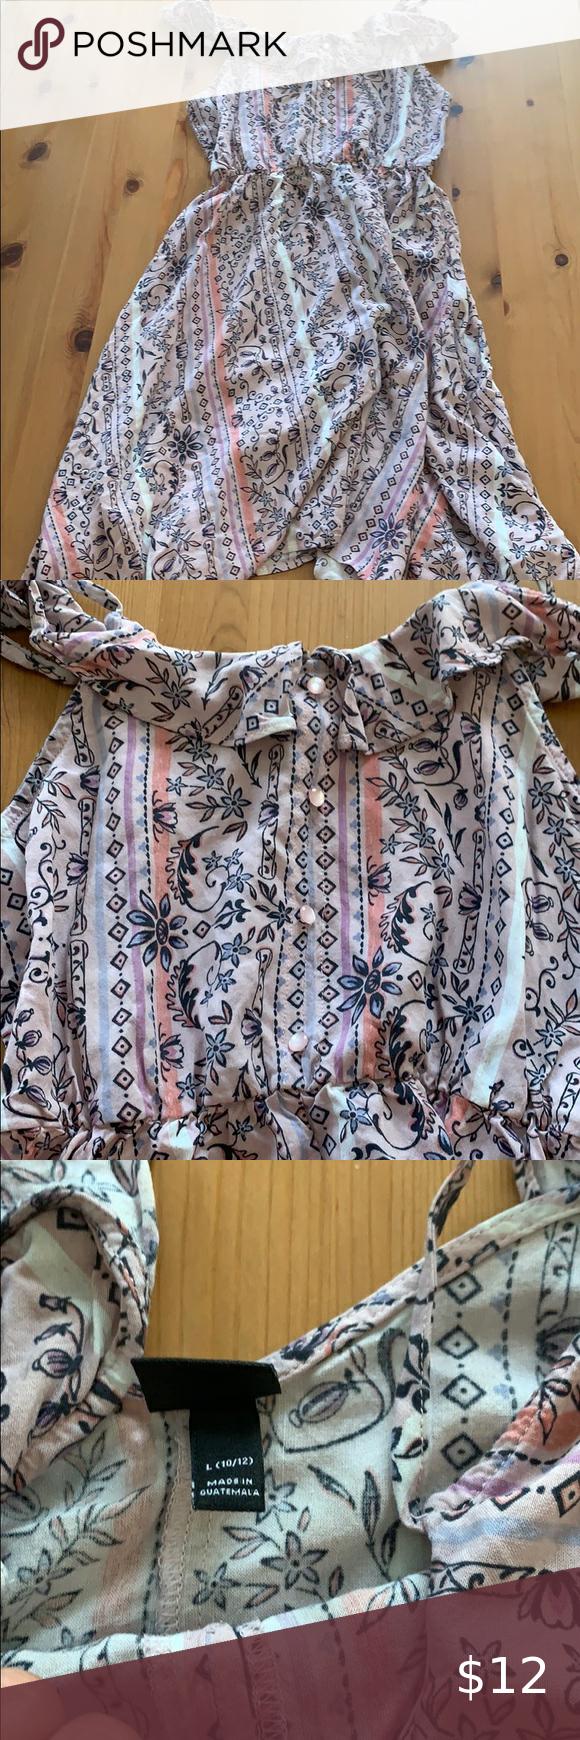 Size 10 12 Summer Dress Summer Dresses Casual Summer Dresses Dresses [ 1740 x 580 Pixel ]